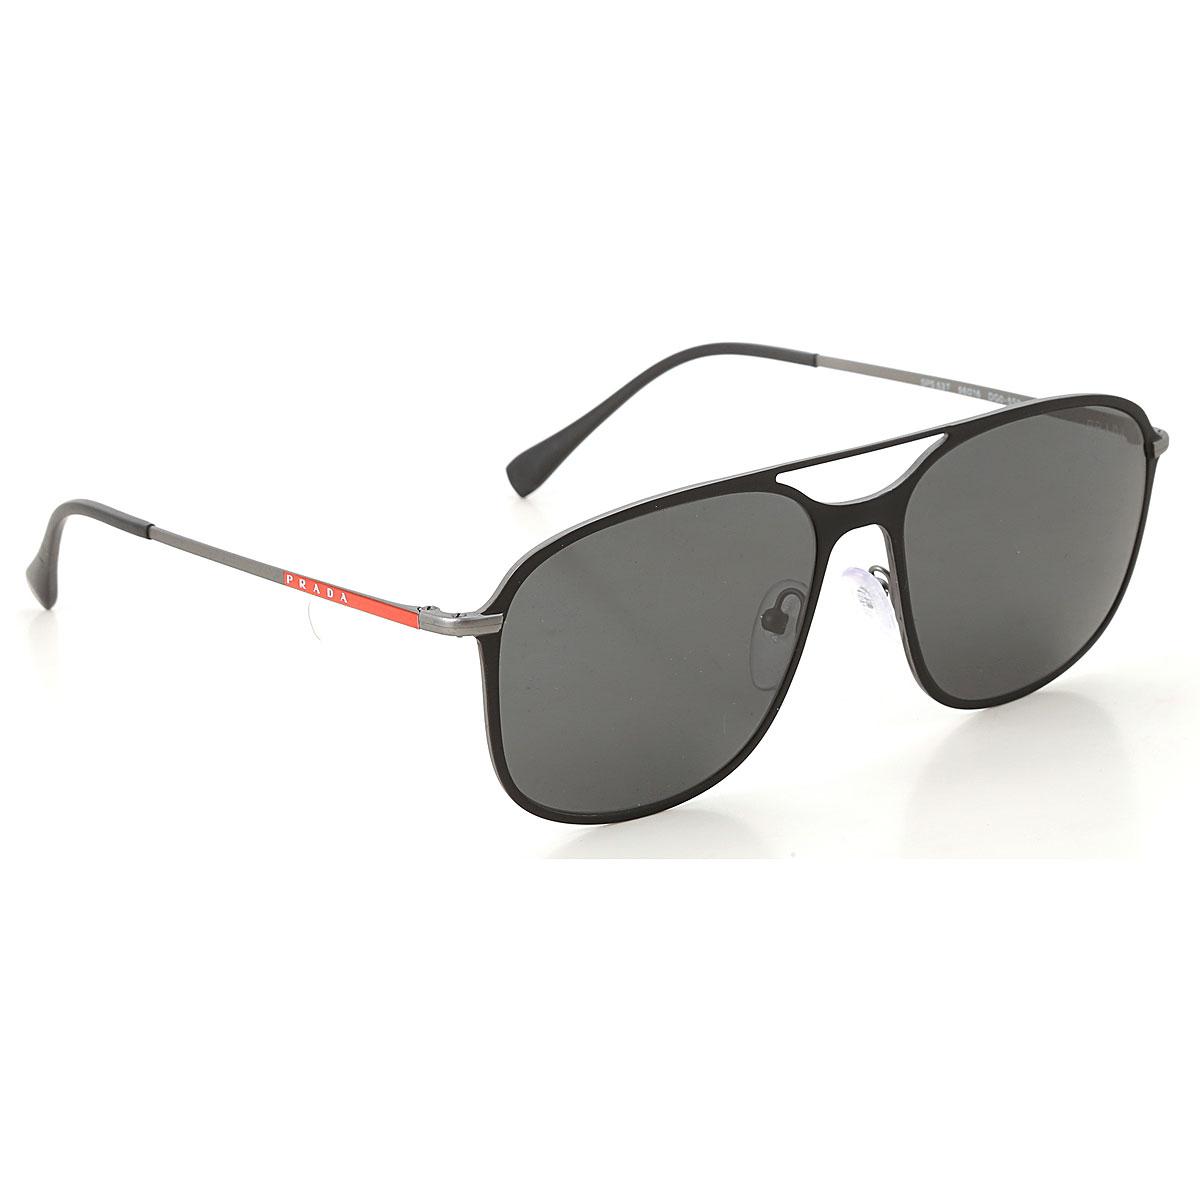 c308ded72a ... Gafas y Lentes de Sol Prada. PANTALLA COMPLETA. 1) Presionar y Girar  Manualmente 2) Doble Clic para Girar Automaticamente